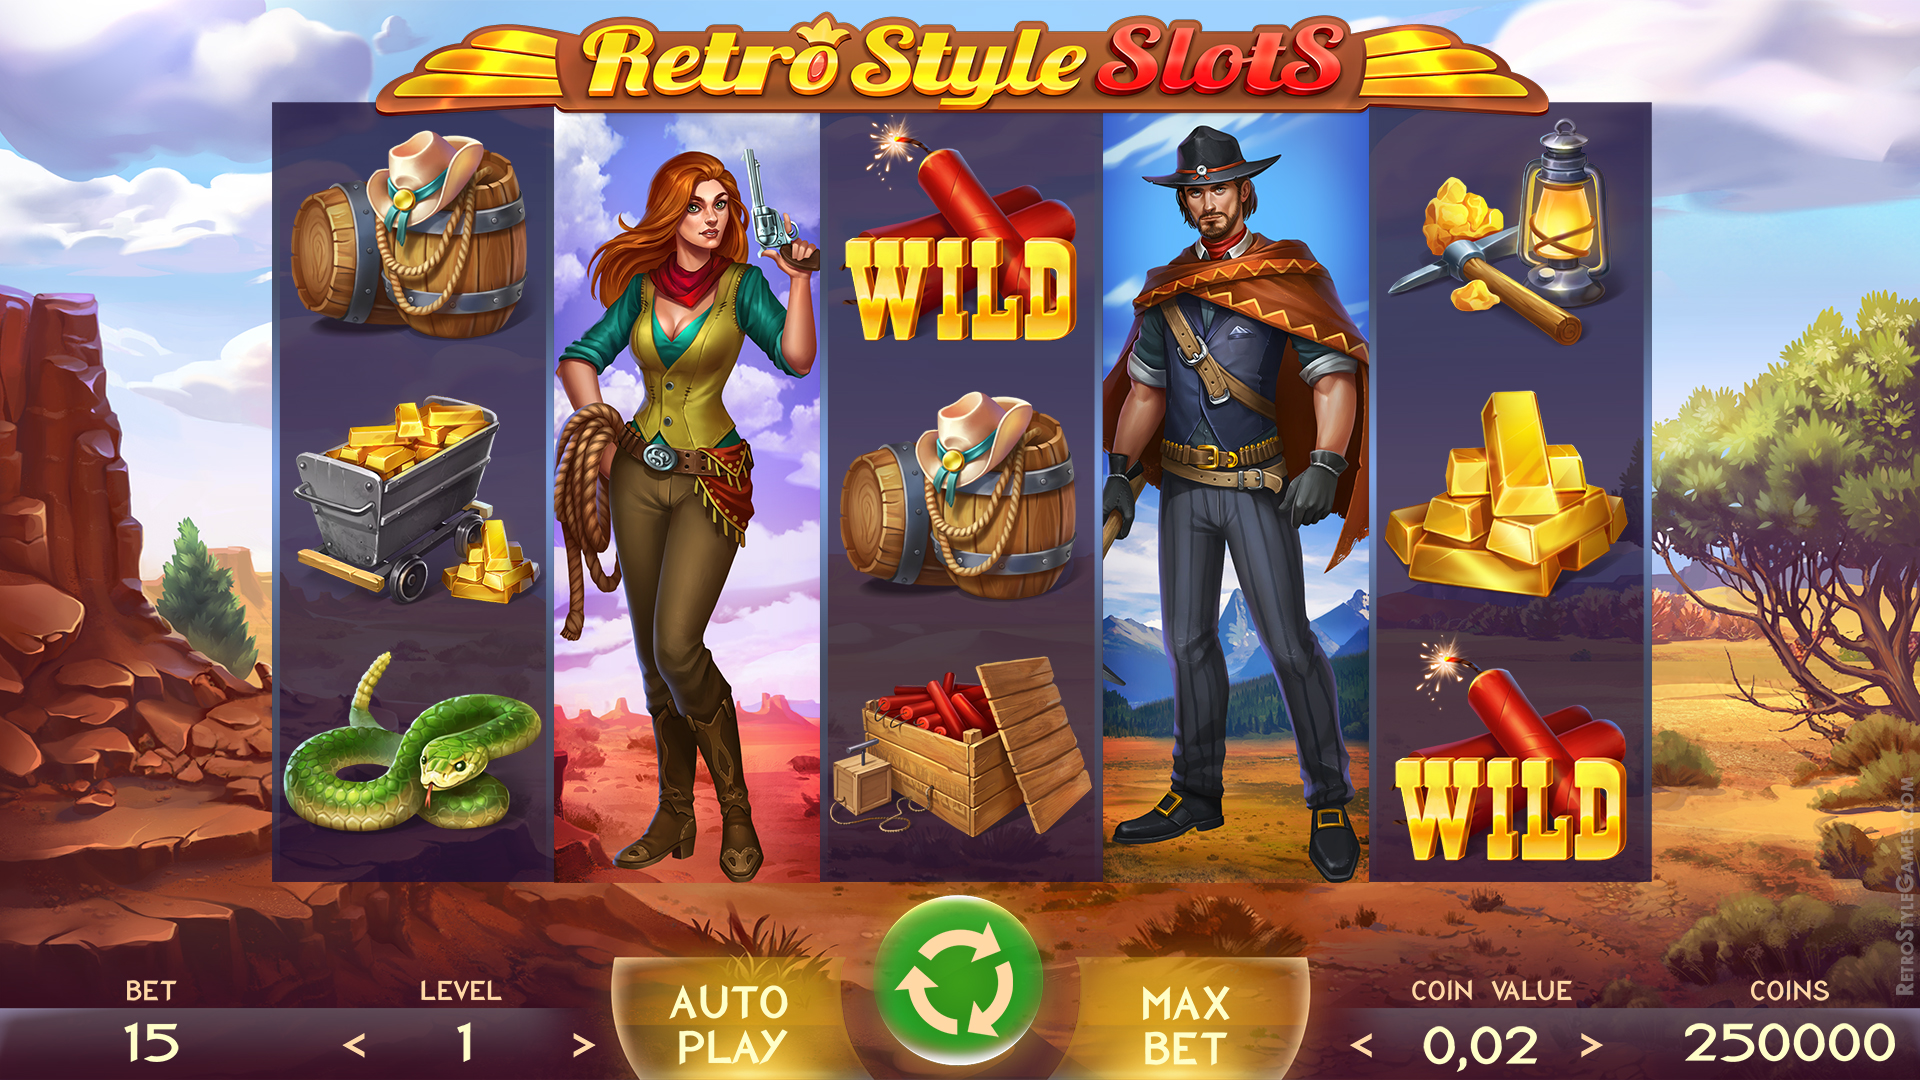 Westworld-themed slots assets